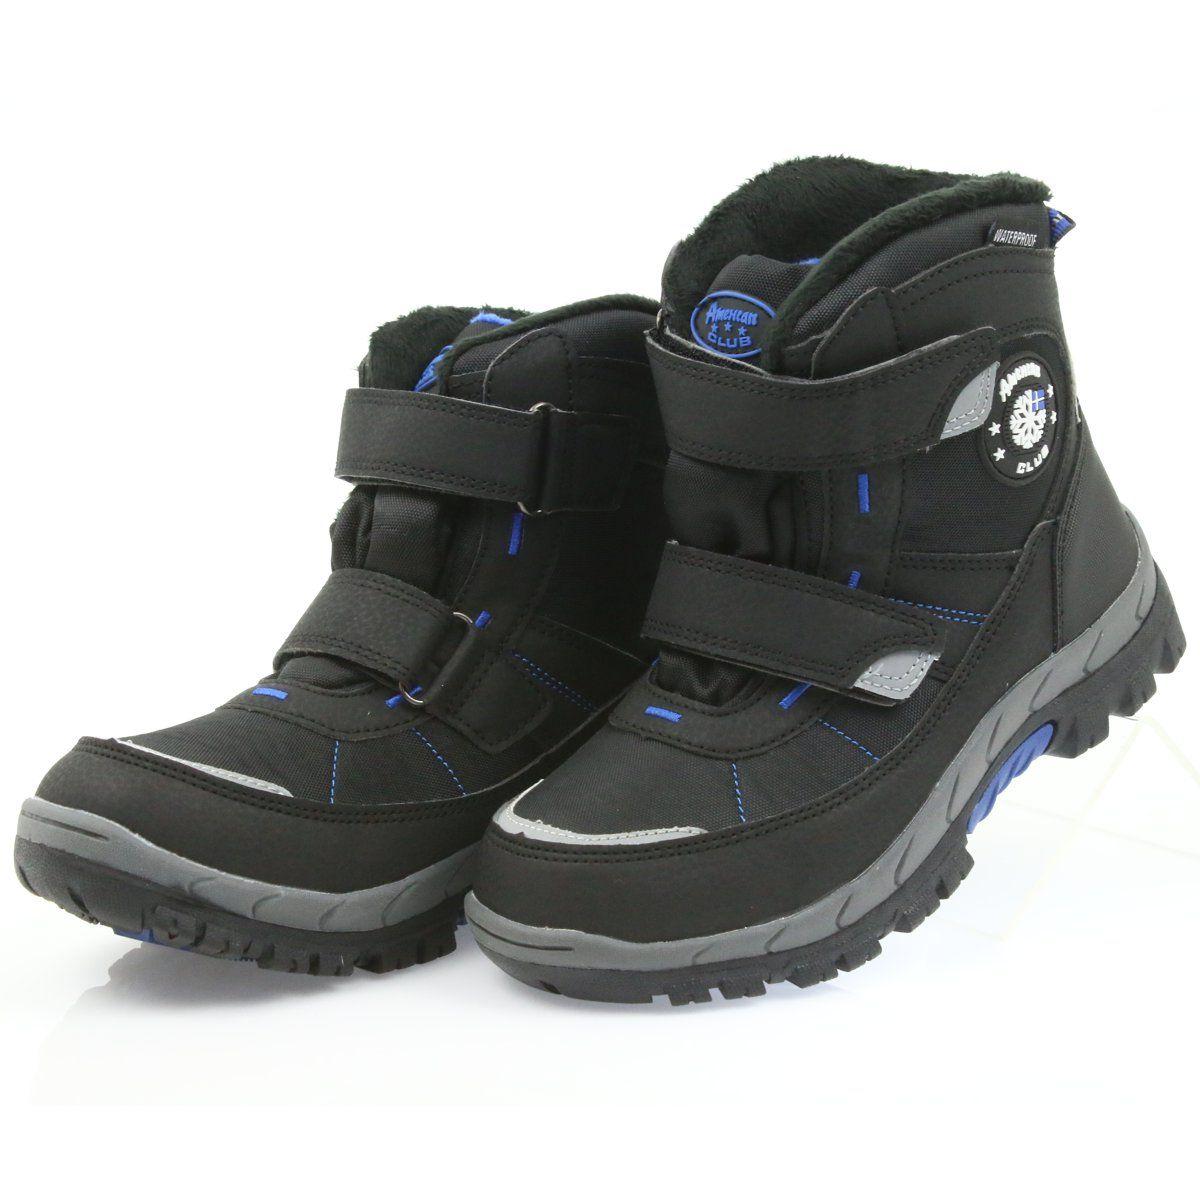 American Club American Kozaki Buty Zimowe Z Membrana 1122 Czarne Niebieskie Boots Shoes Winter Boot